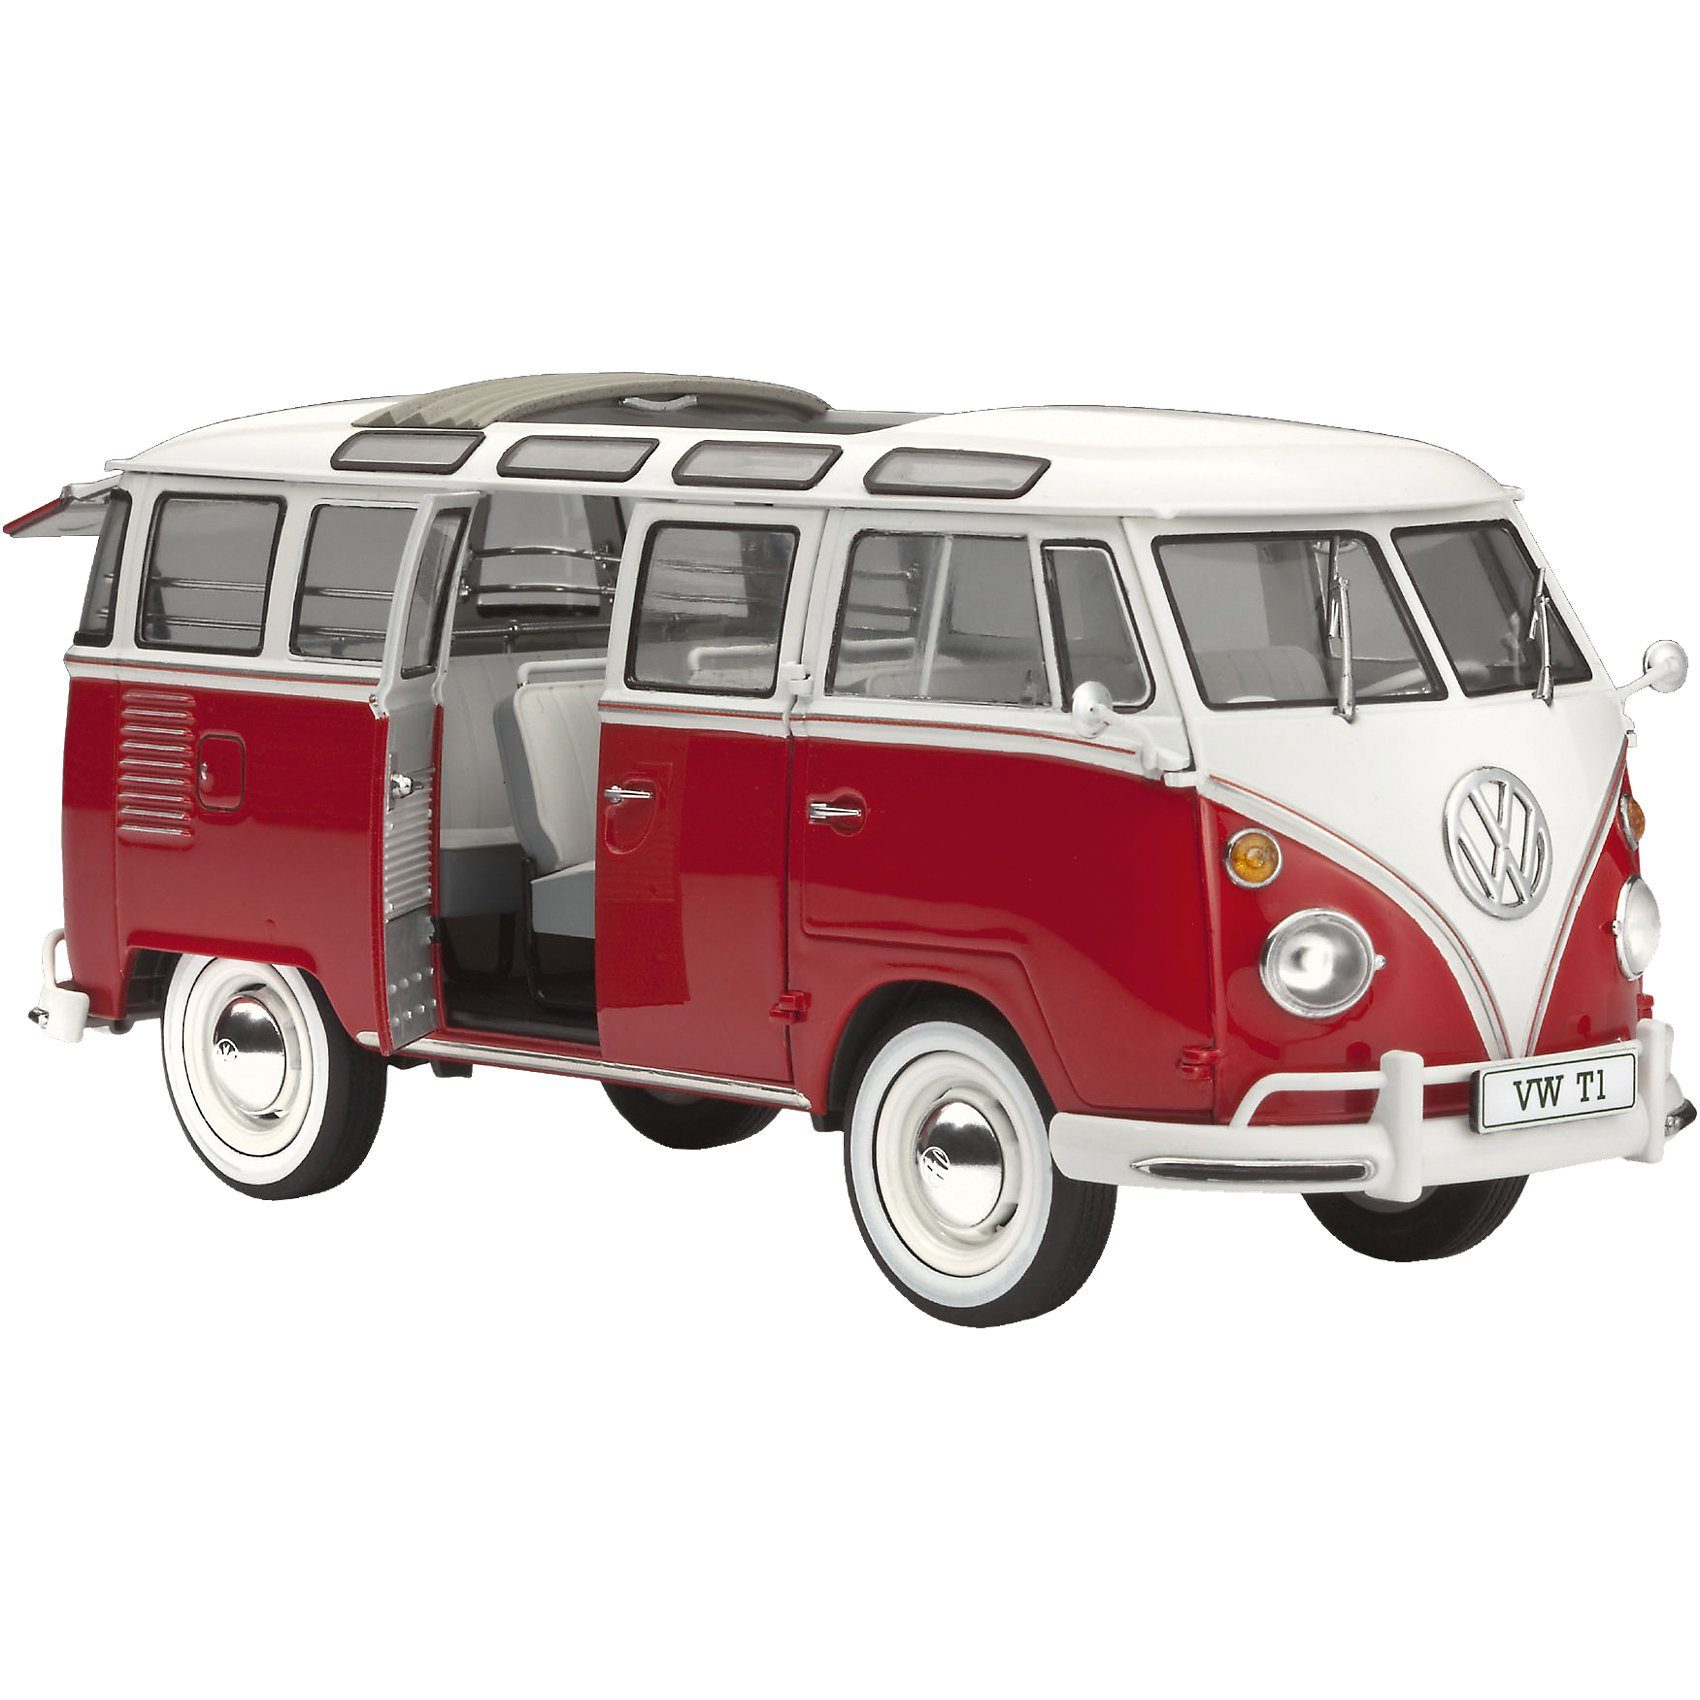 Revell Modellbausatz VW T1 Samba Bus Maßstab 1:24